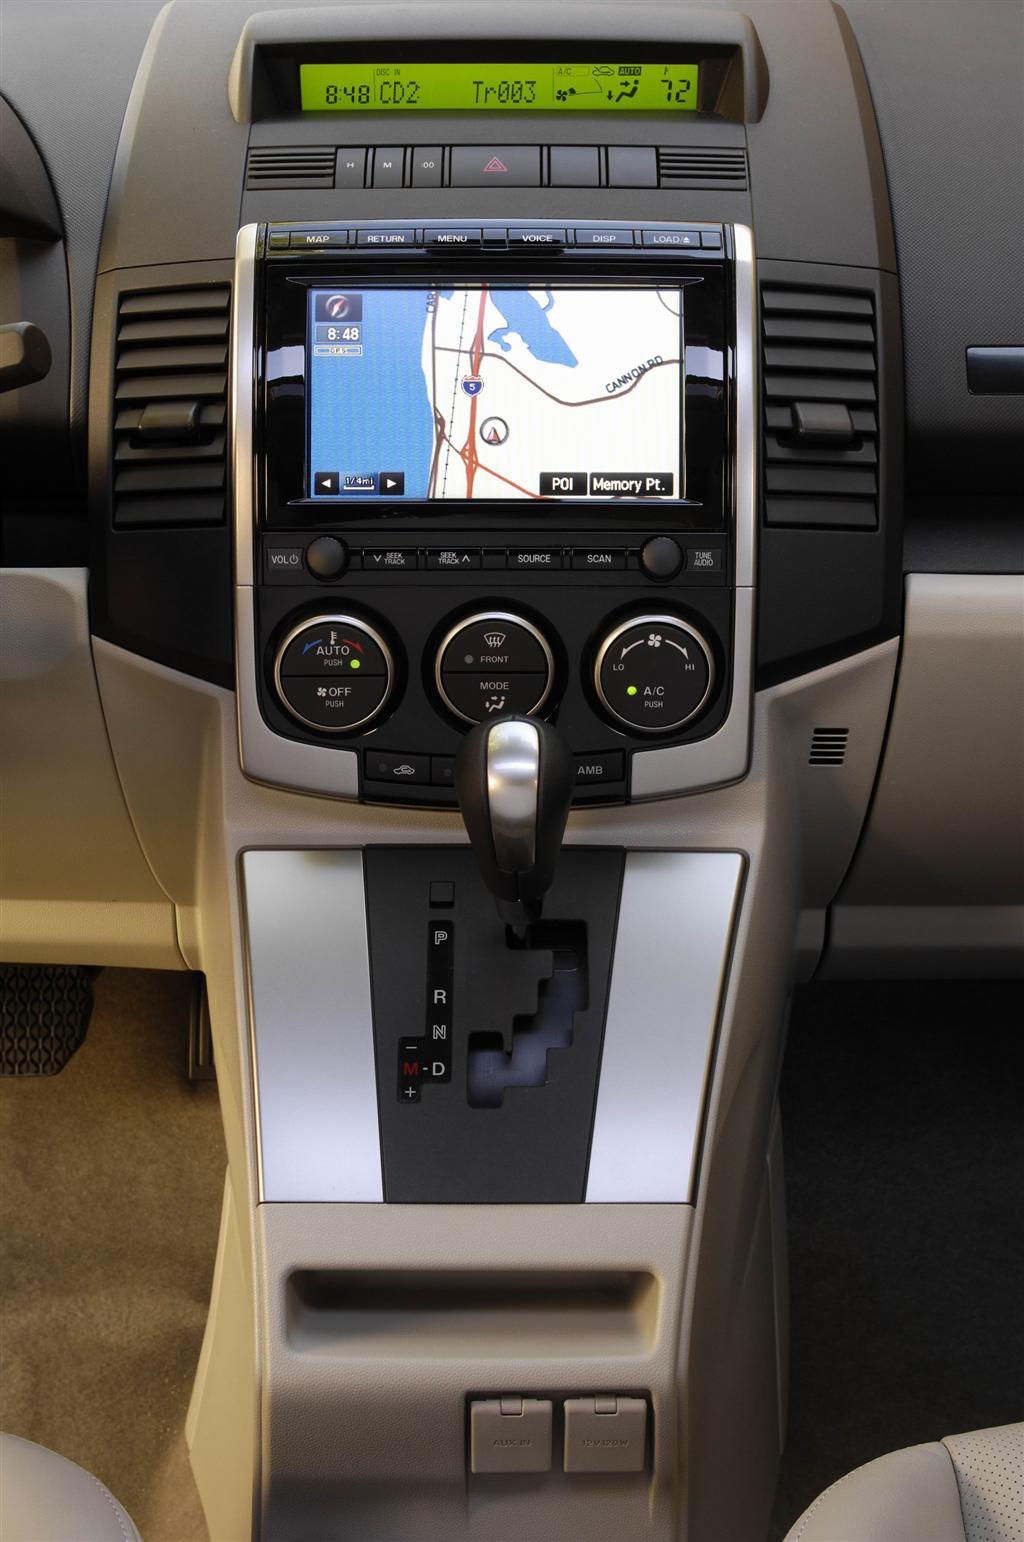 2010 mazda 5 news and information - 2004 mazda 3 interior accessories ...